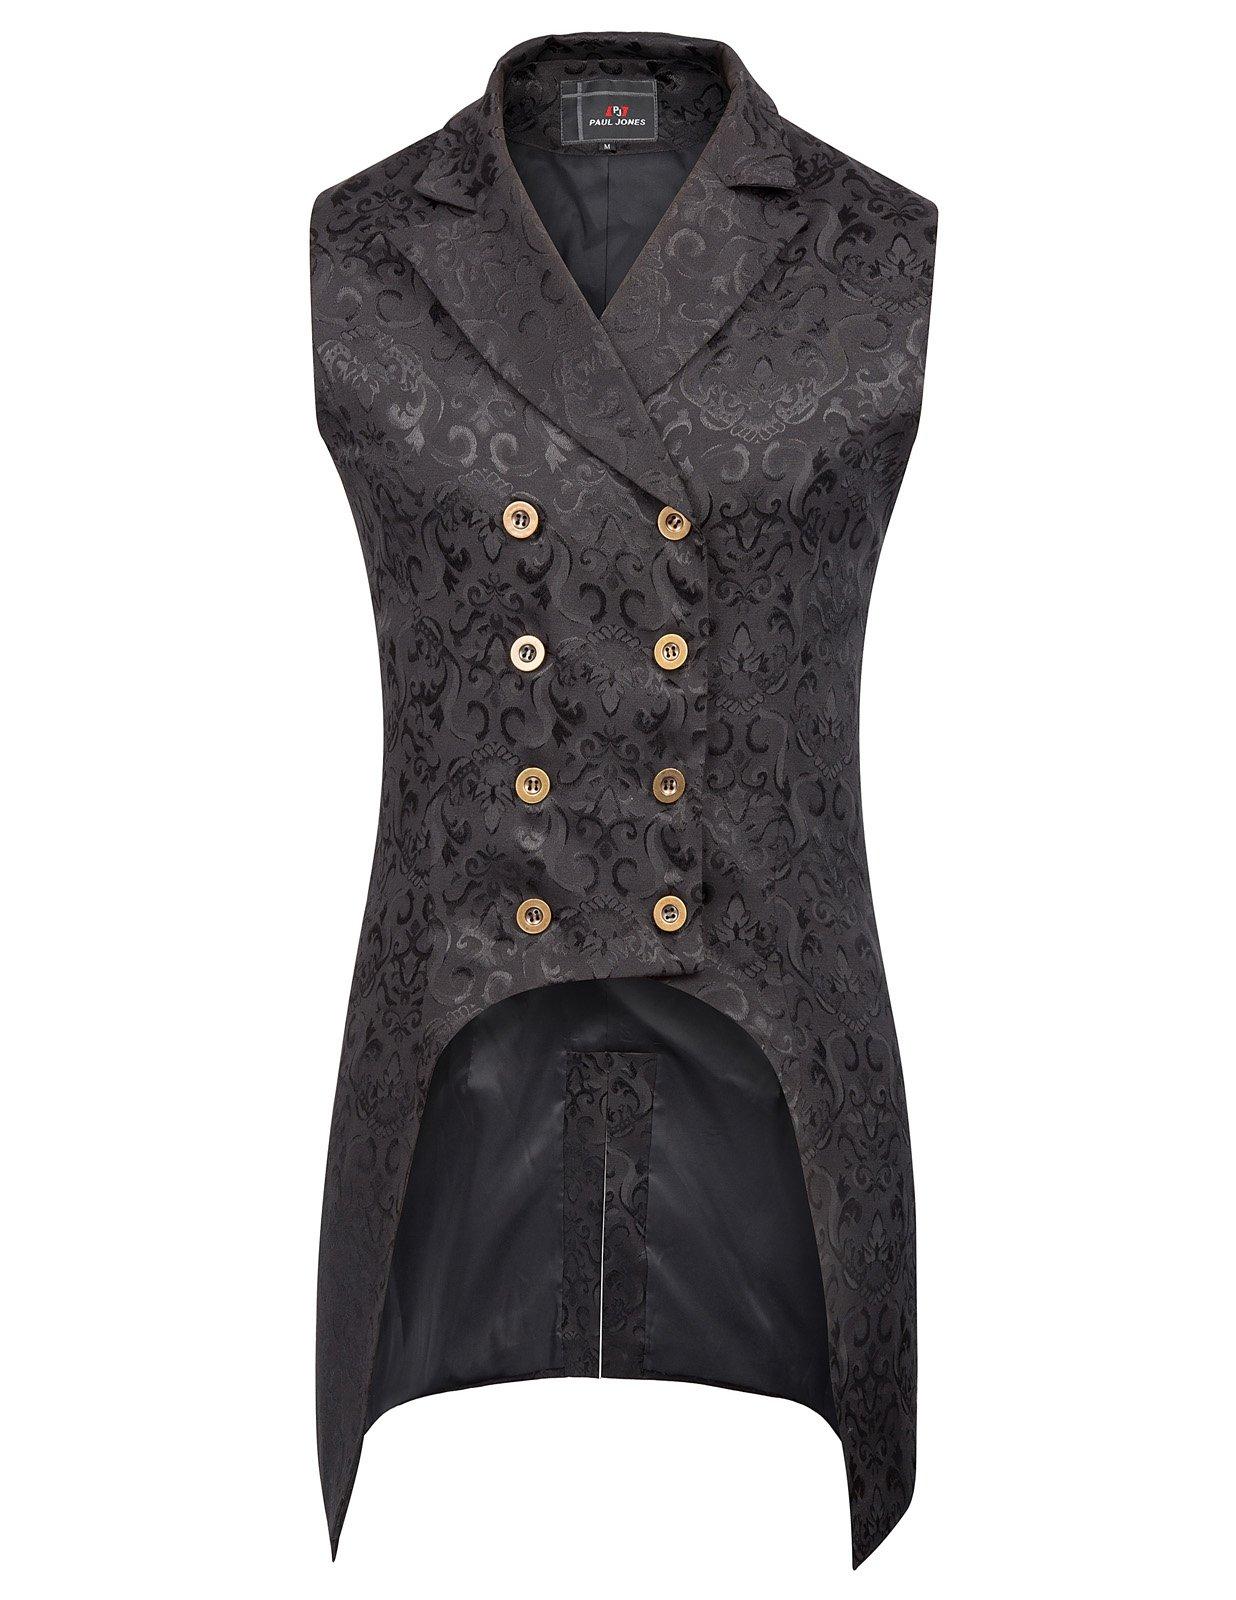 PJ PAUL JONES Mens Victorian Steampunk Waistcoat Gothic Vest M Black by PJ PAUL JONES